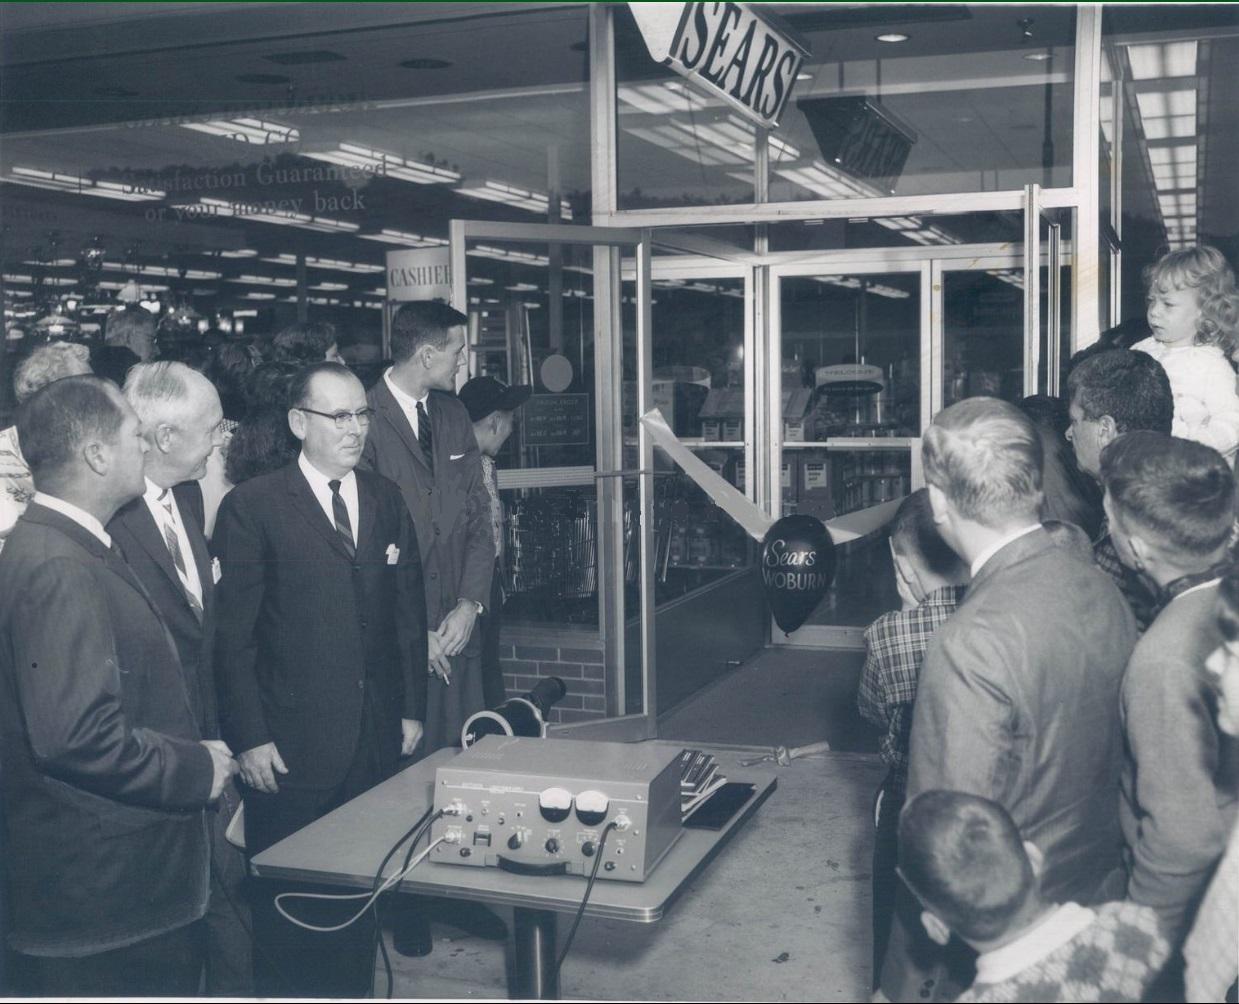 Sears Woburn grand opening